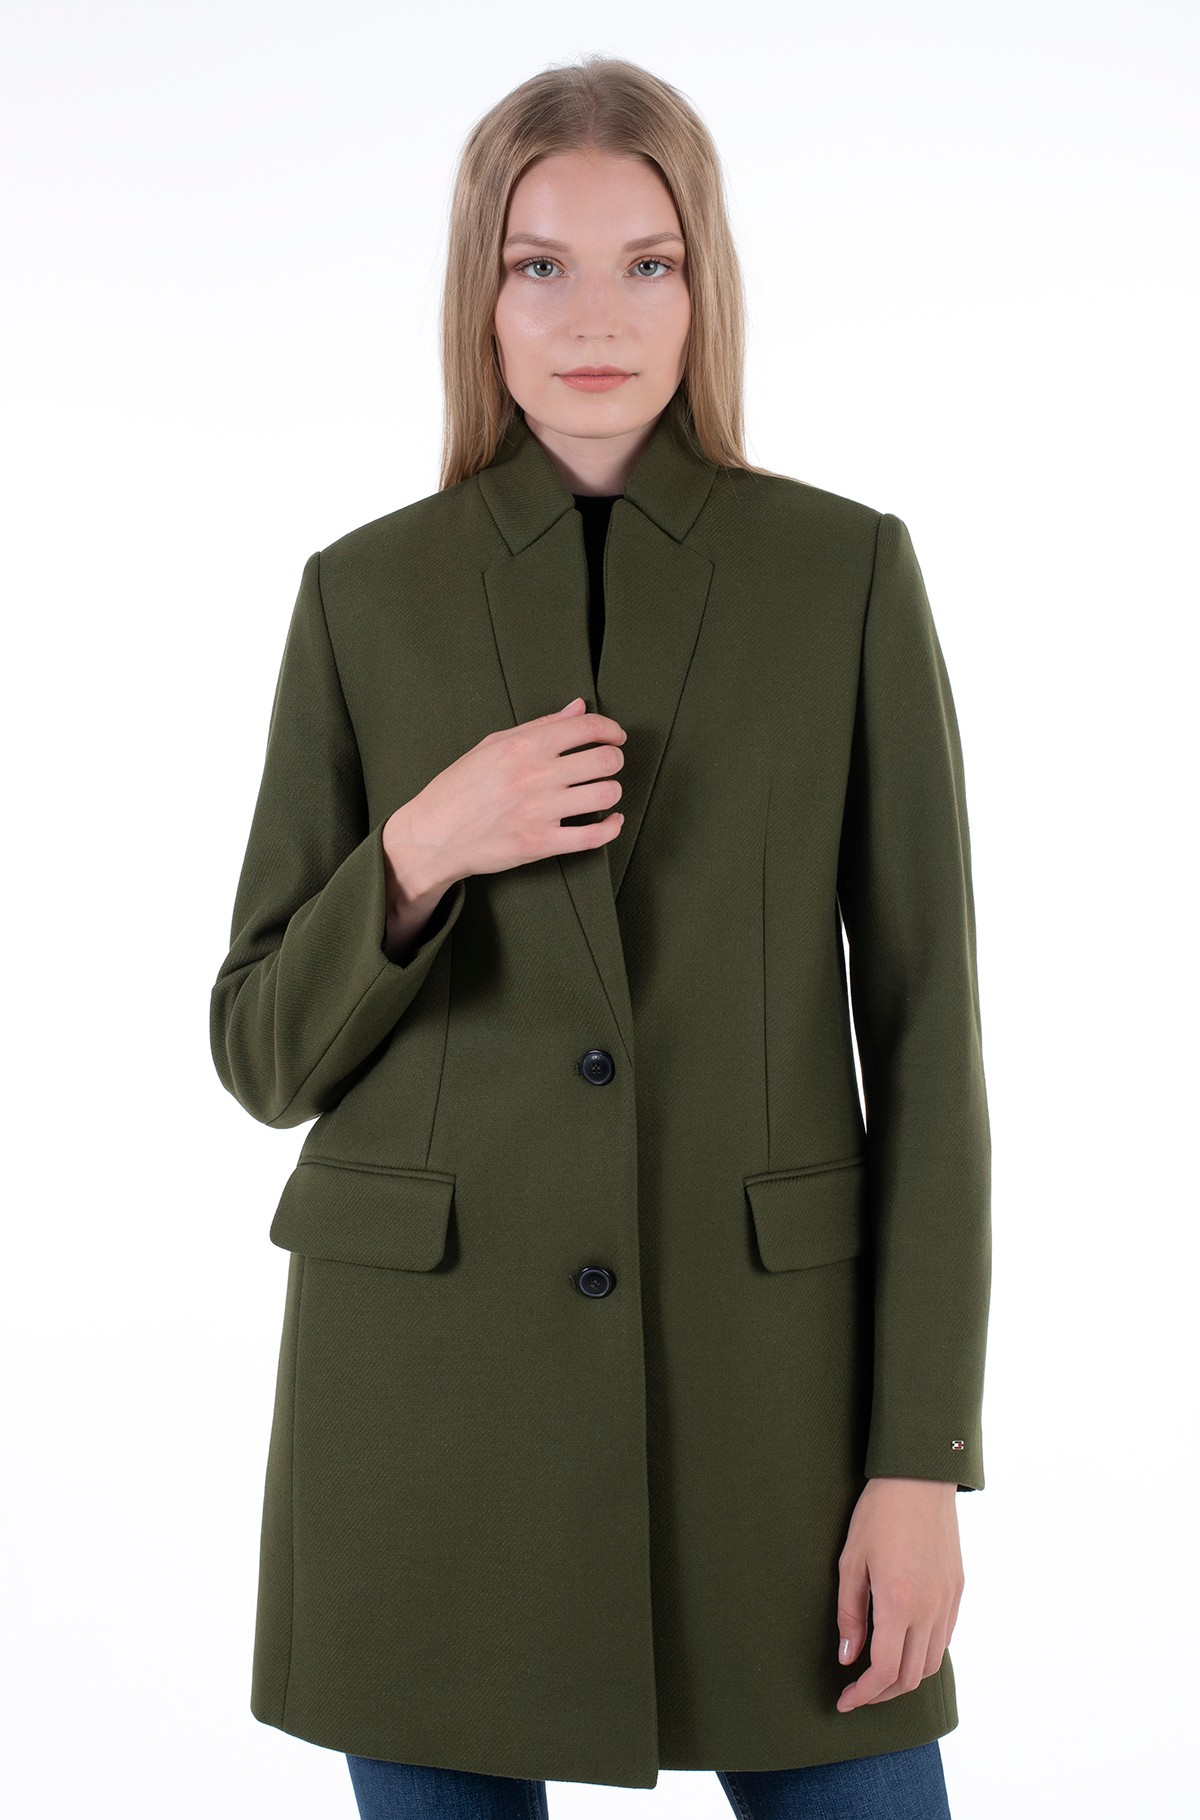 Coat WOOL BLEND SB HIP LENGTH COAT-full-2